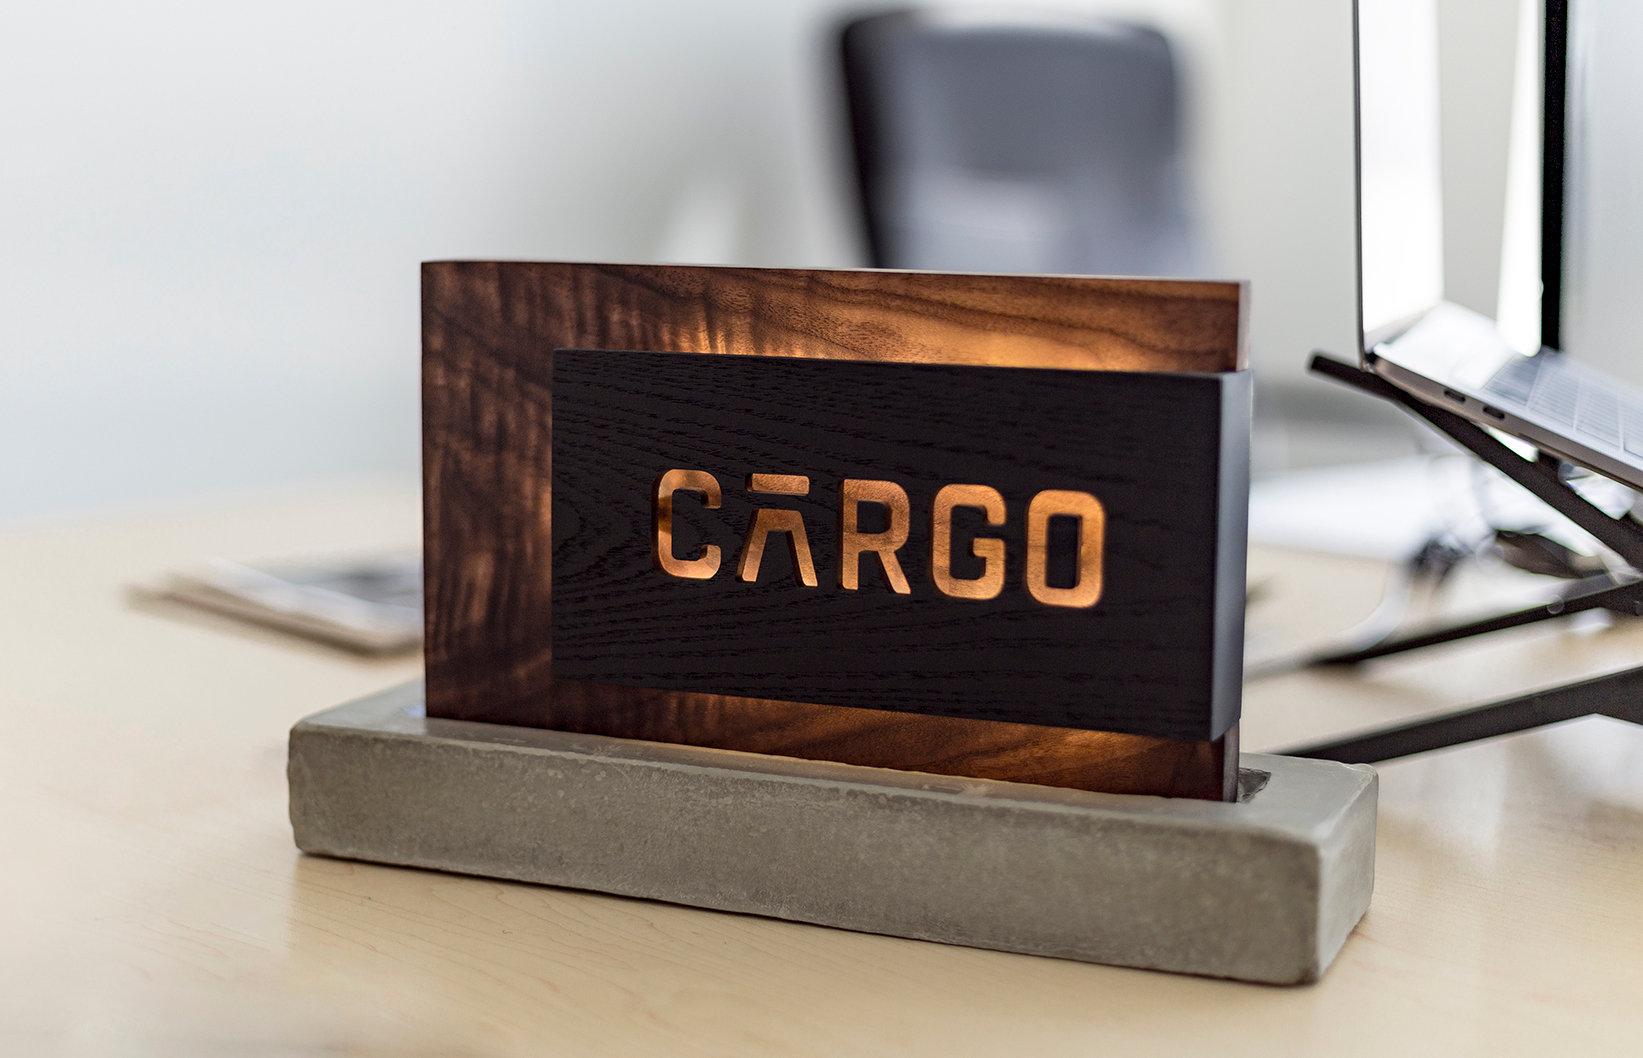 Rencontre avec Cargo/Meeting with Cargo